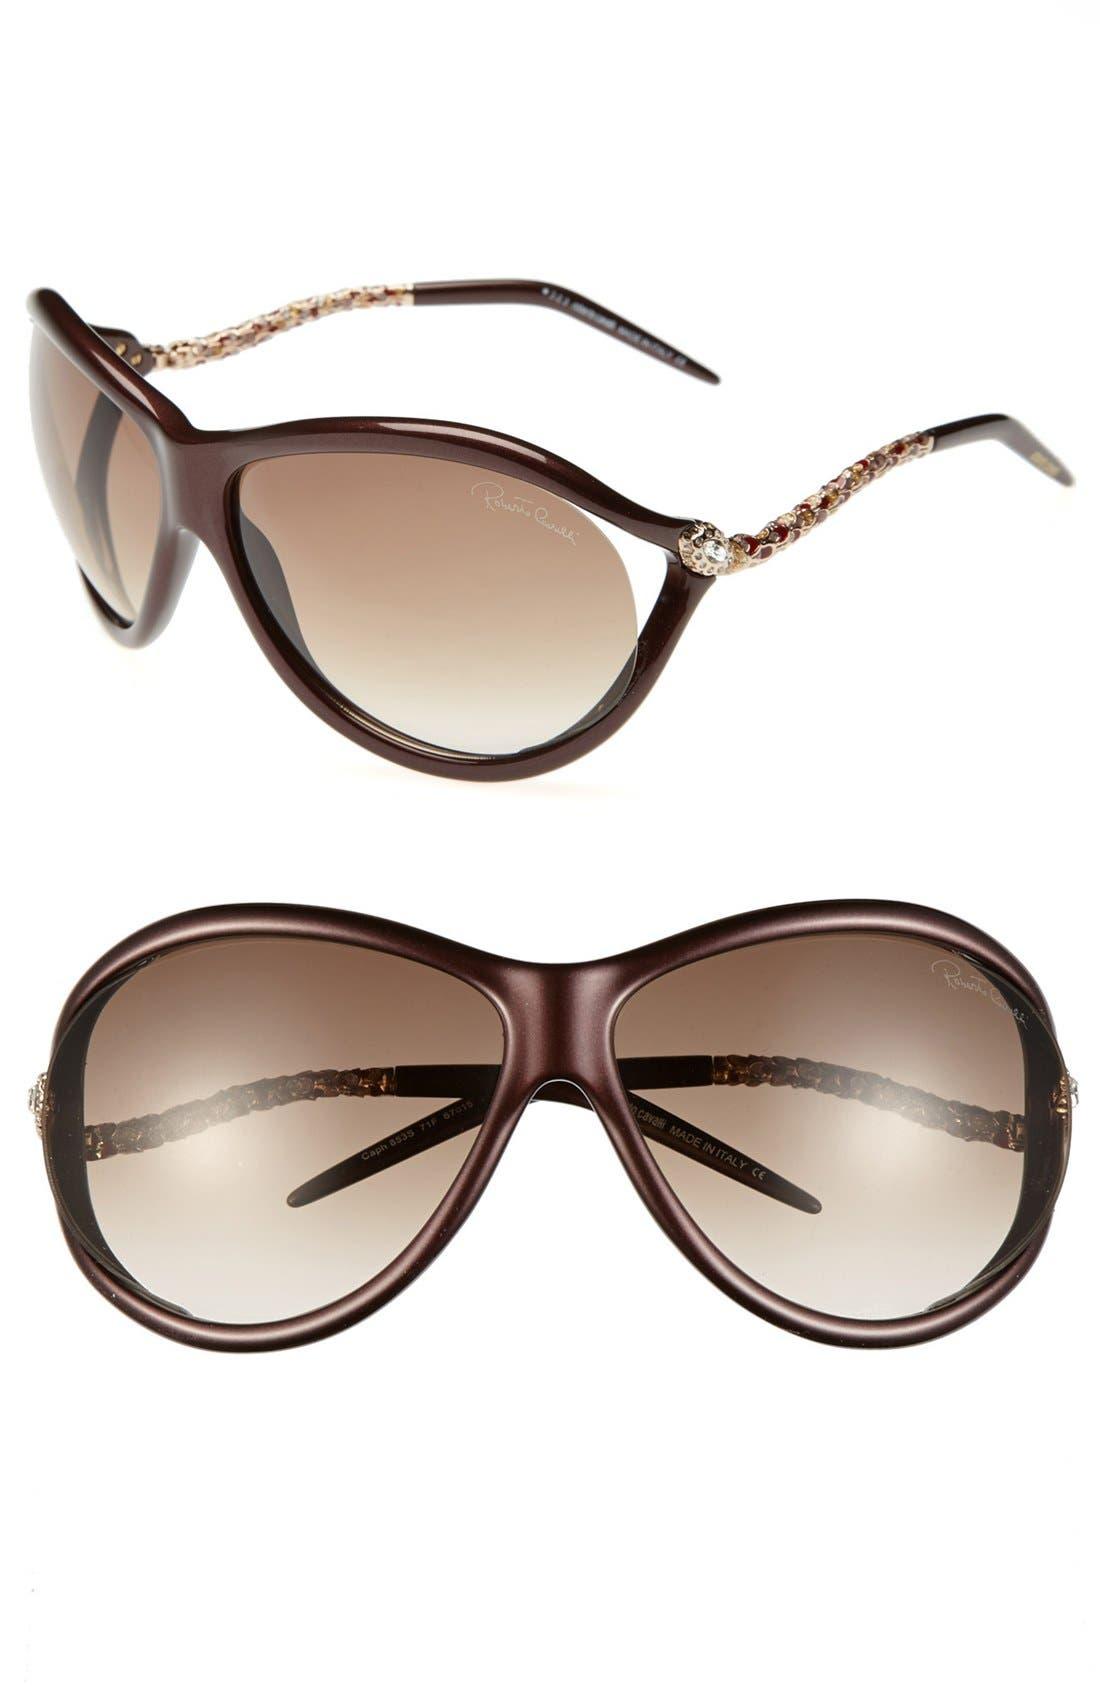 Alternate Image 1 Selected - Roberto Cavalli 'Caph' 67mm Enamel Detail Oversized Sunglasses